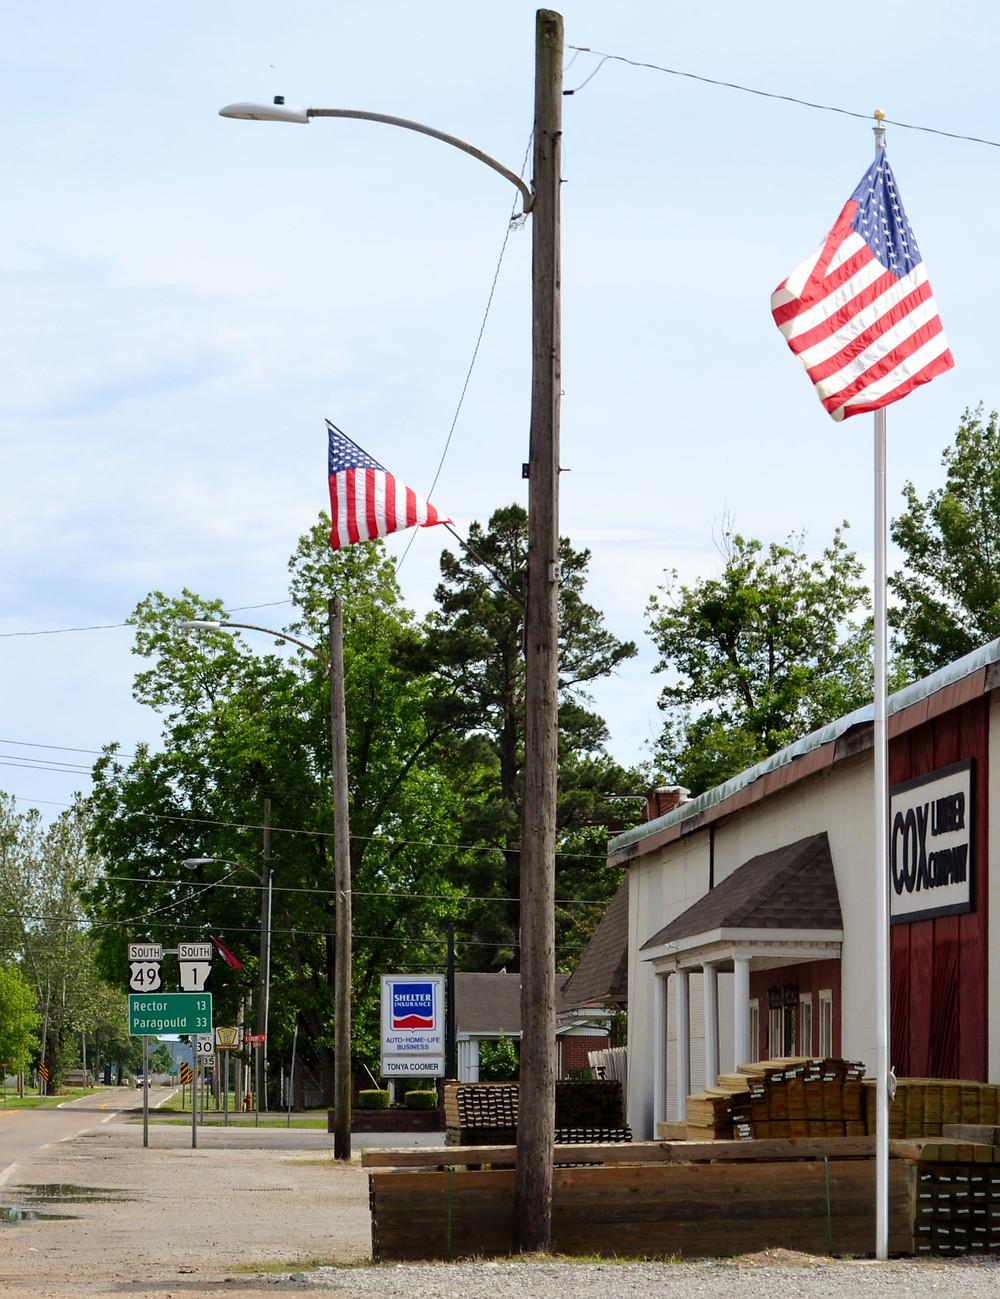 Highway 49 - end of the road Piggott Arkansas